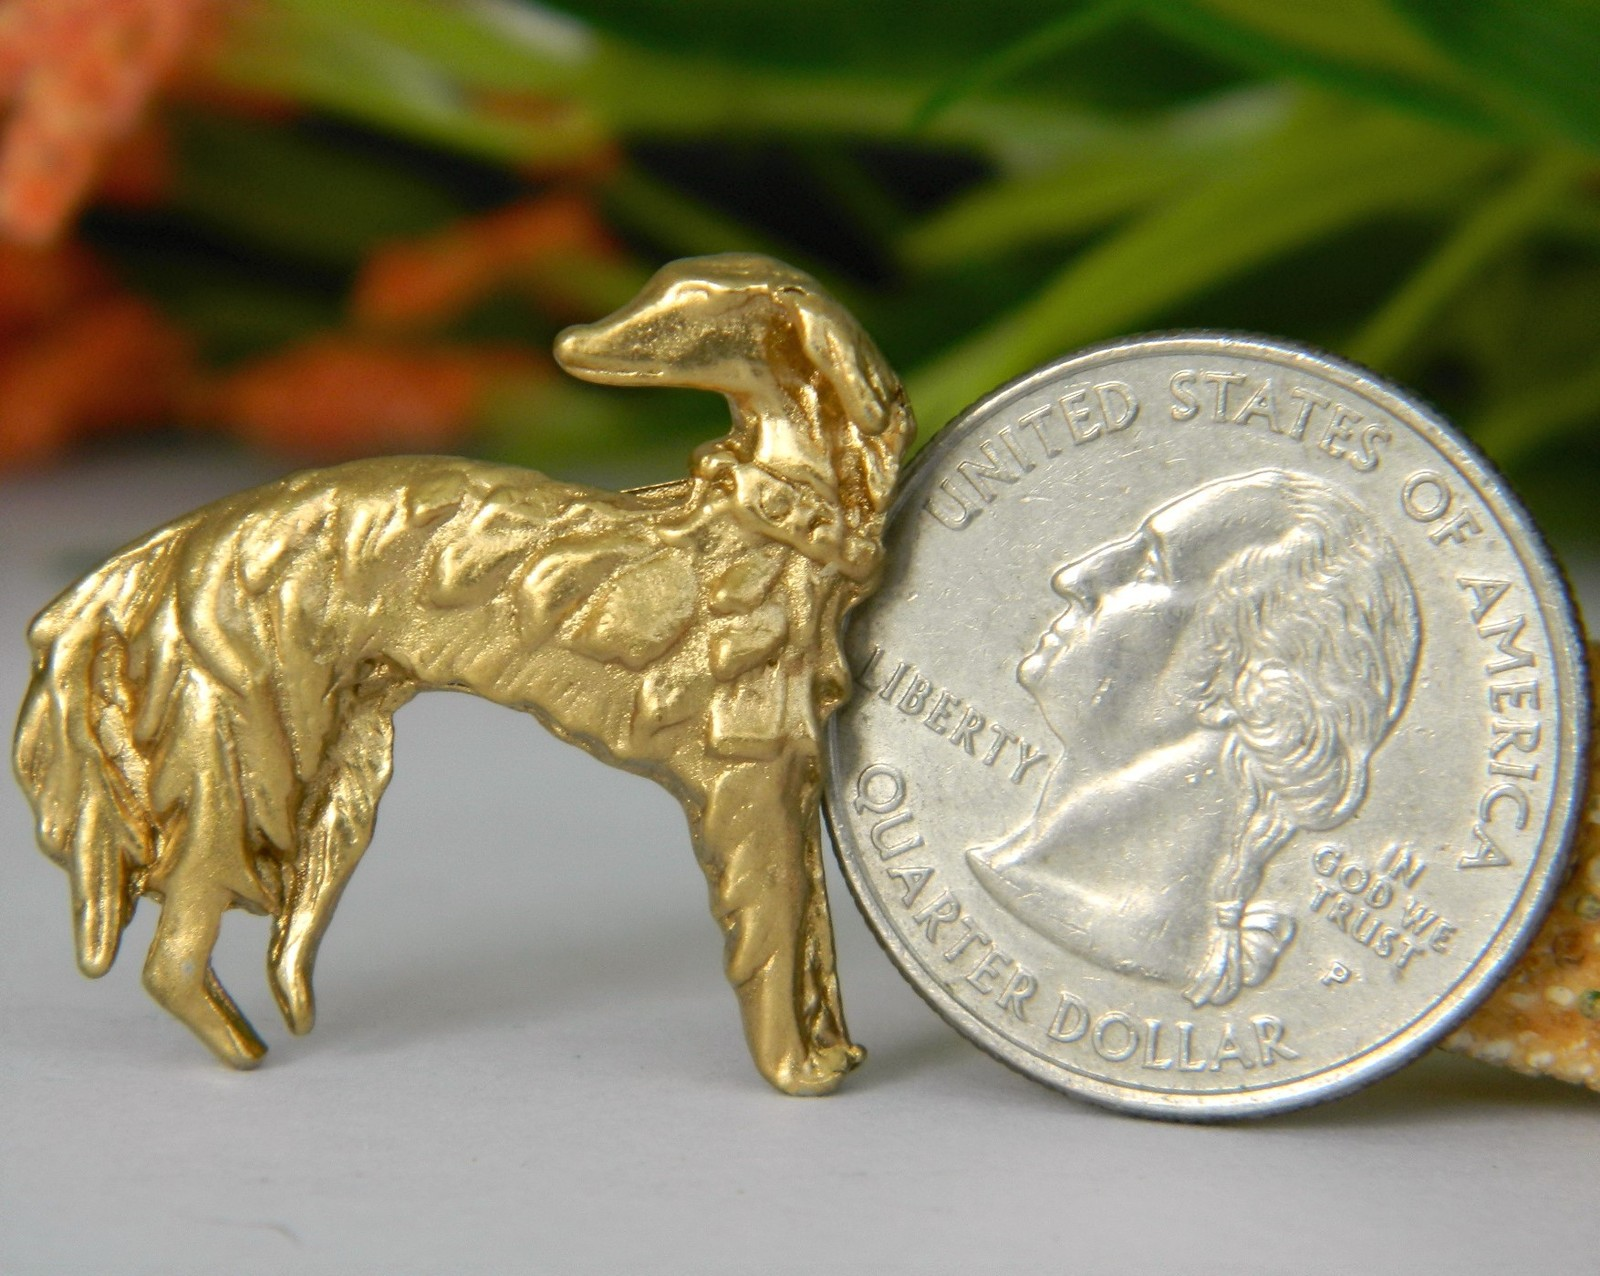 Vintage Borzoi Russian Wolfhound Saluki Hound Dog Brooch Pin Goldtone